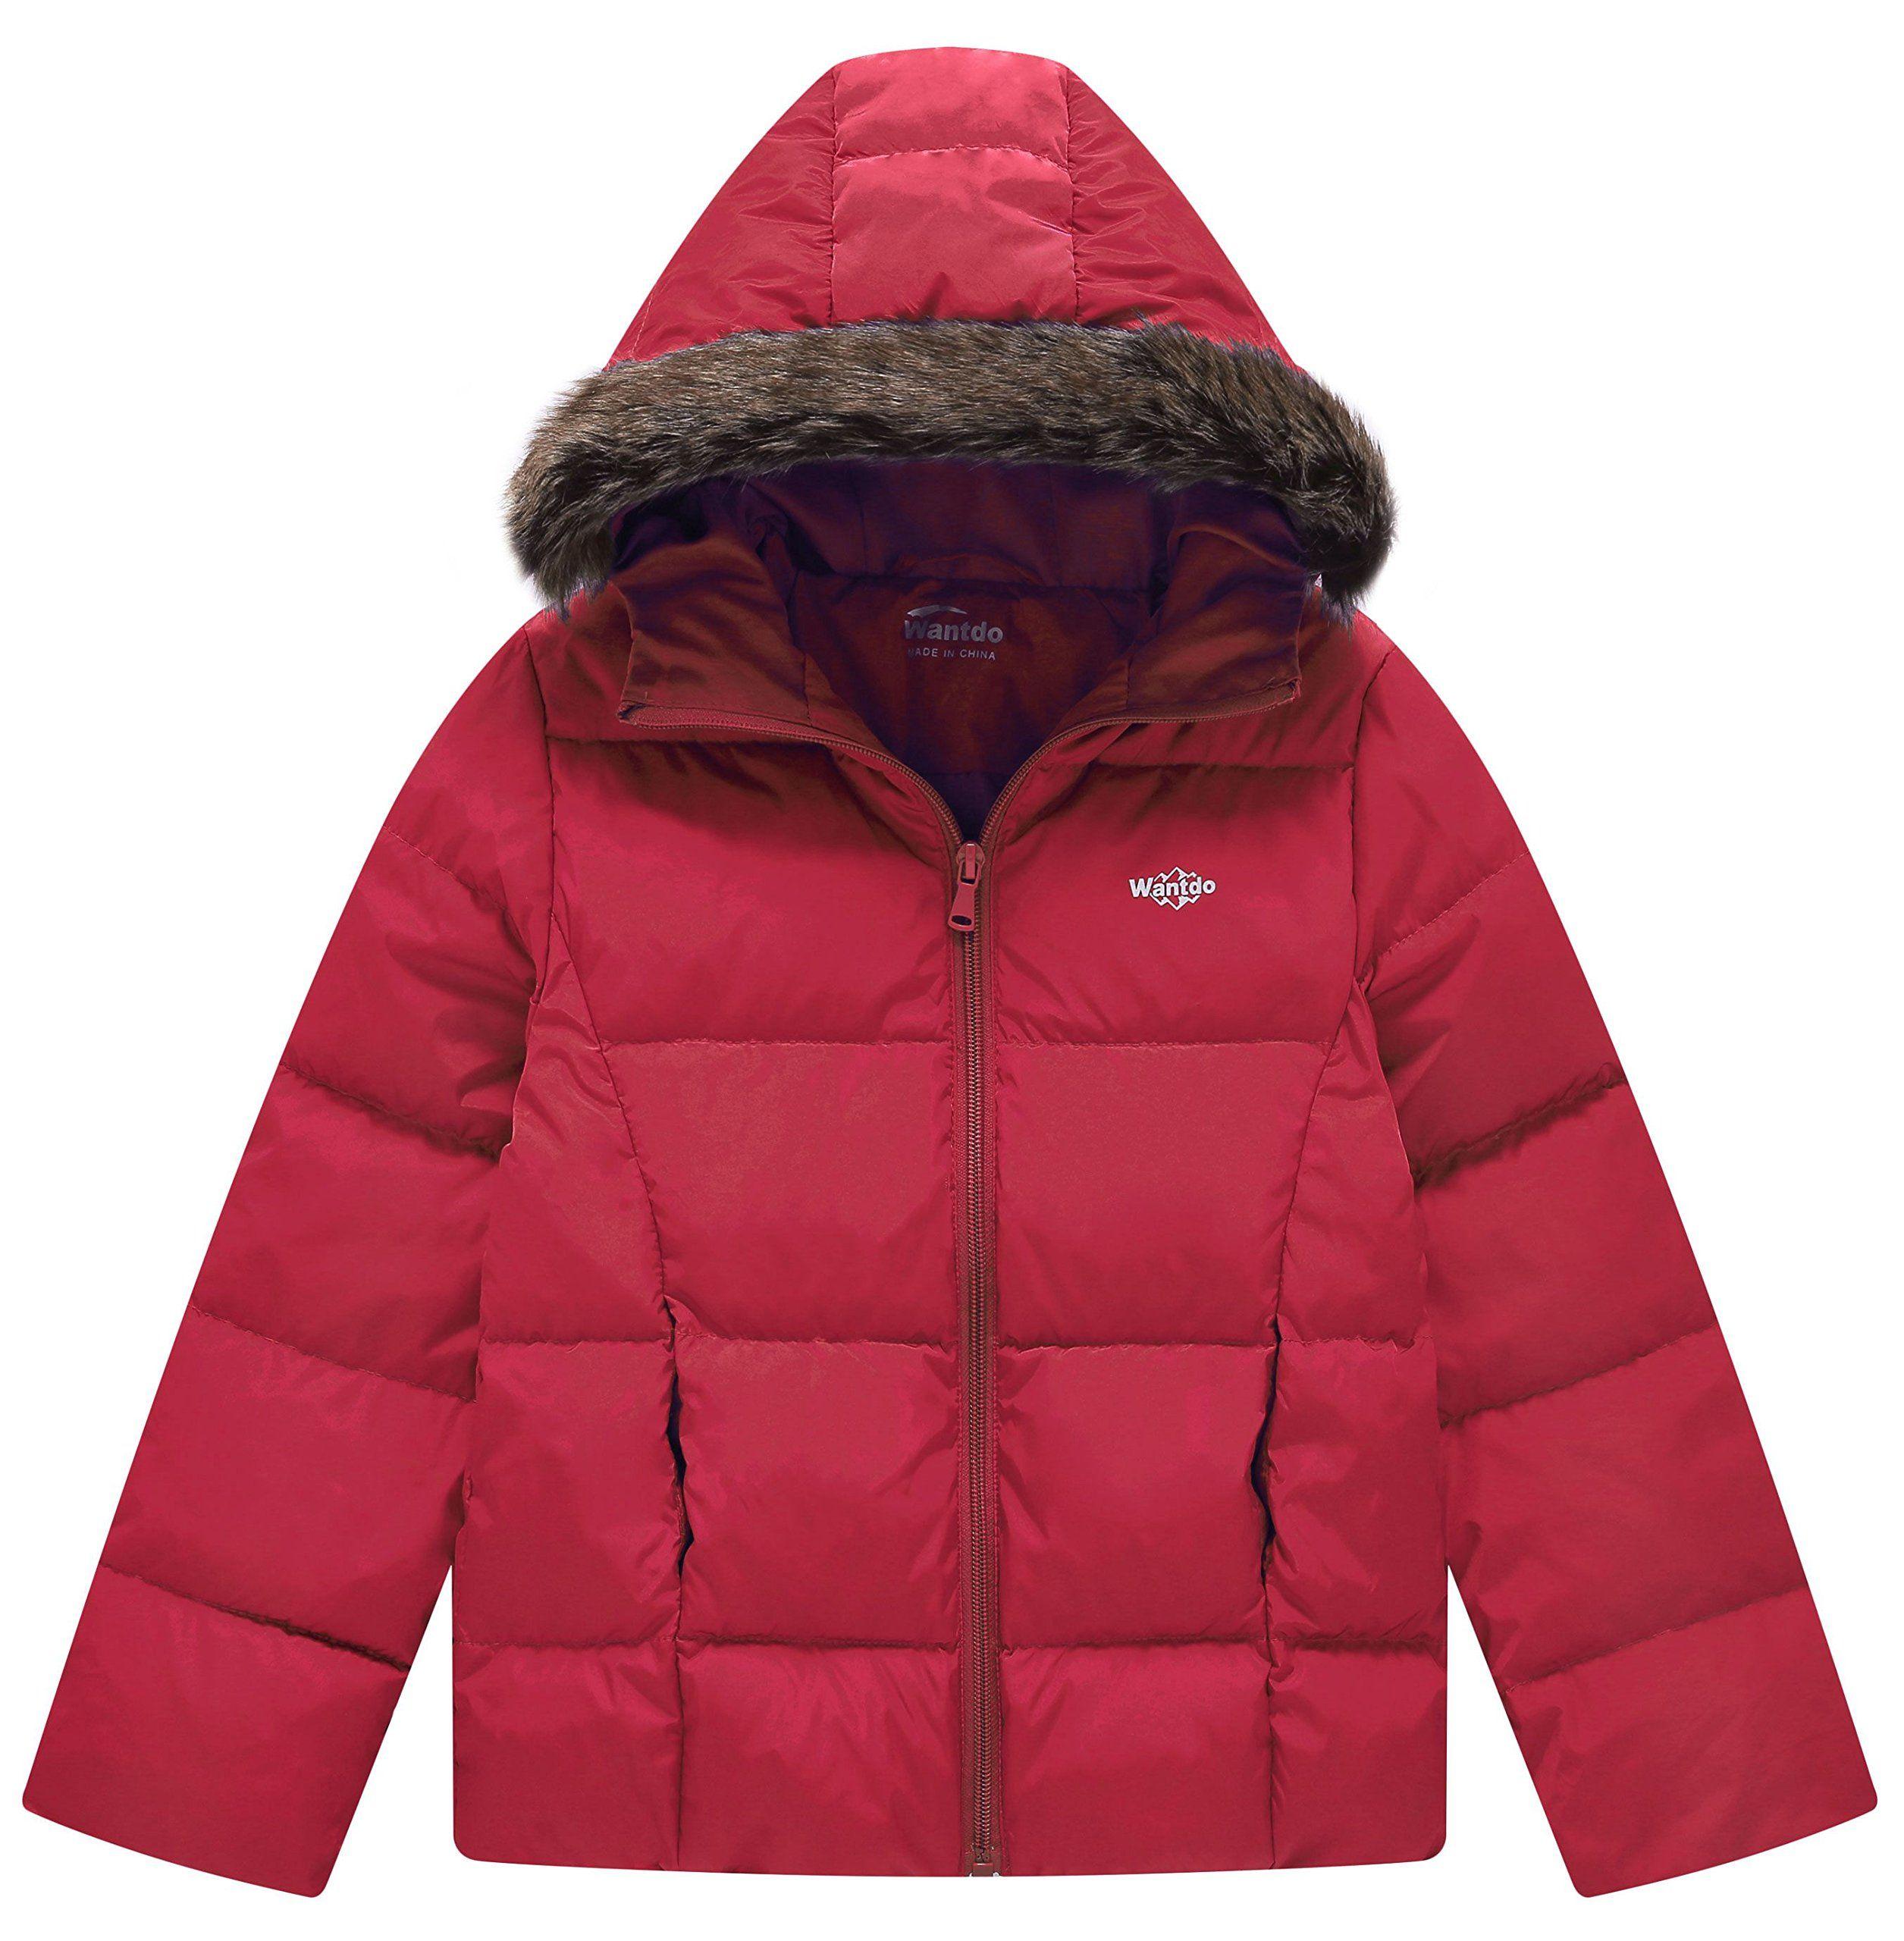 4f77c4290c4f Wantdo Boy s Light Weight Casual Winter Jacket Hooded Down Coats ...